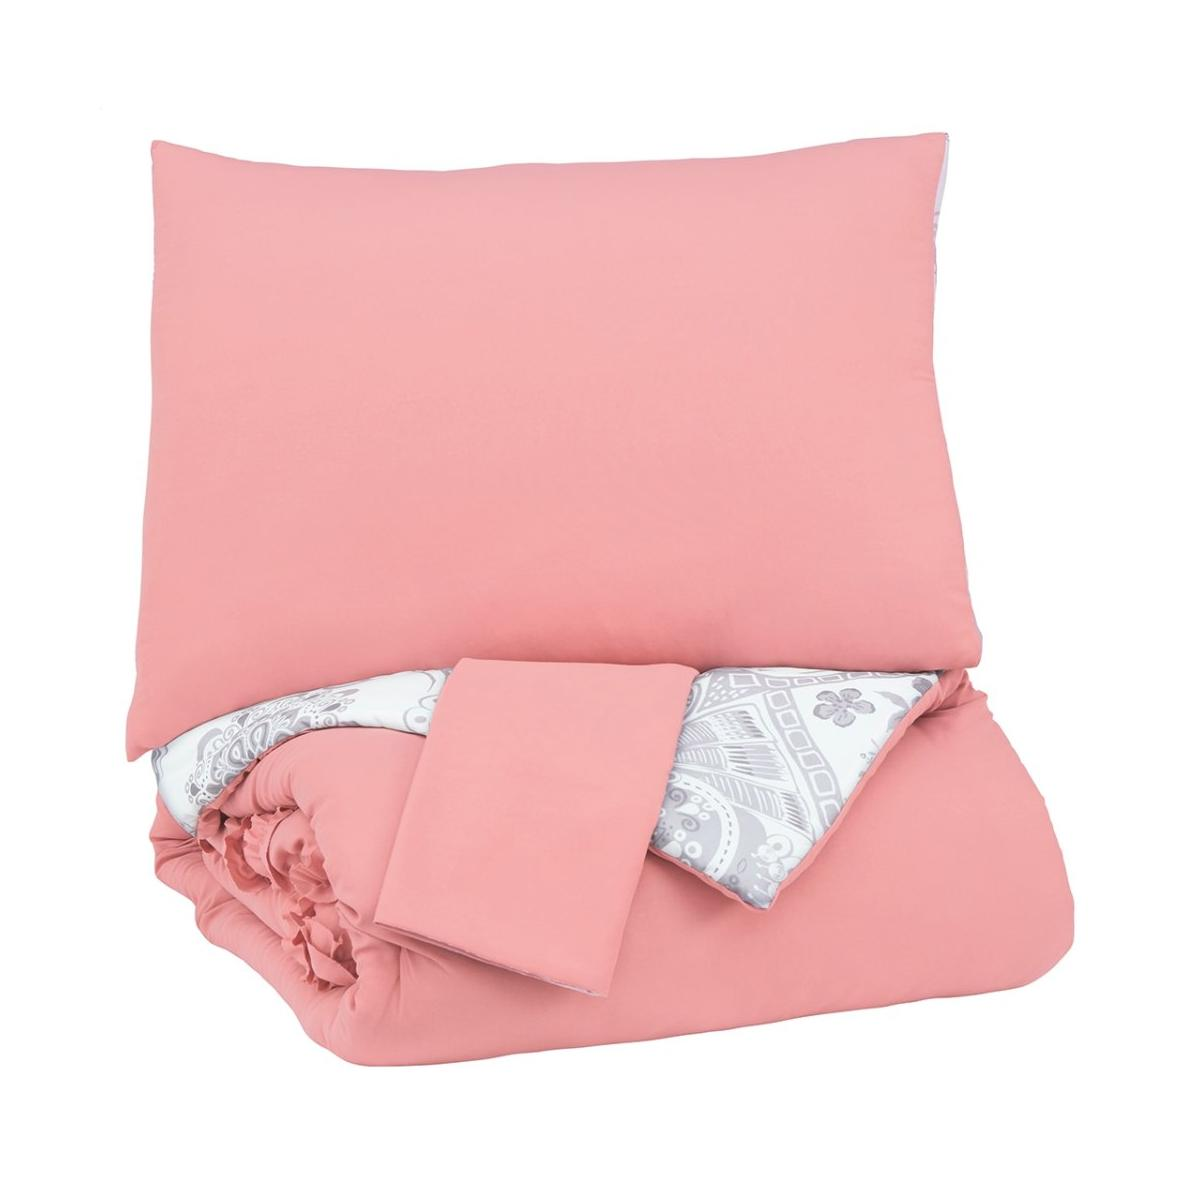 See Details - Avaleigh Full Comforter Set